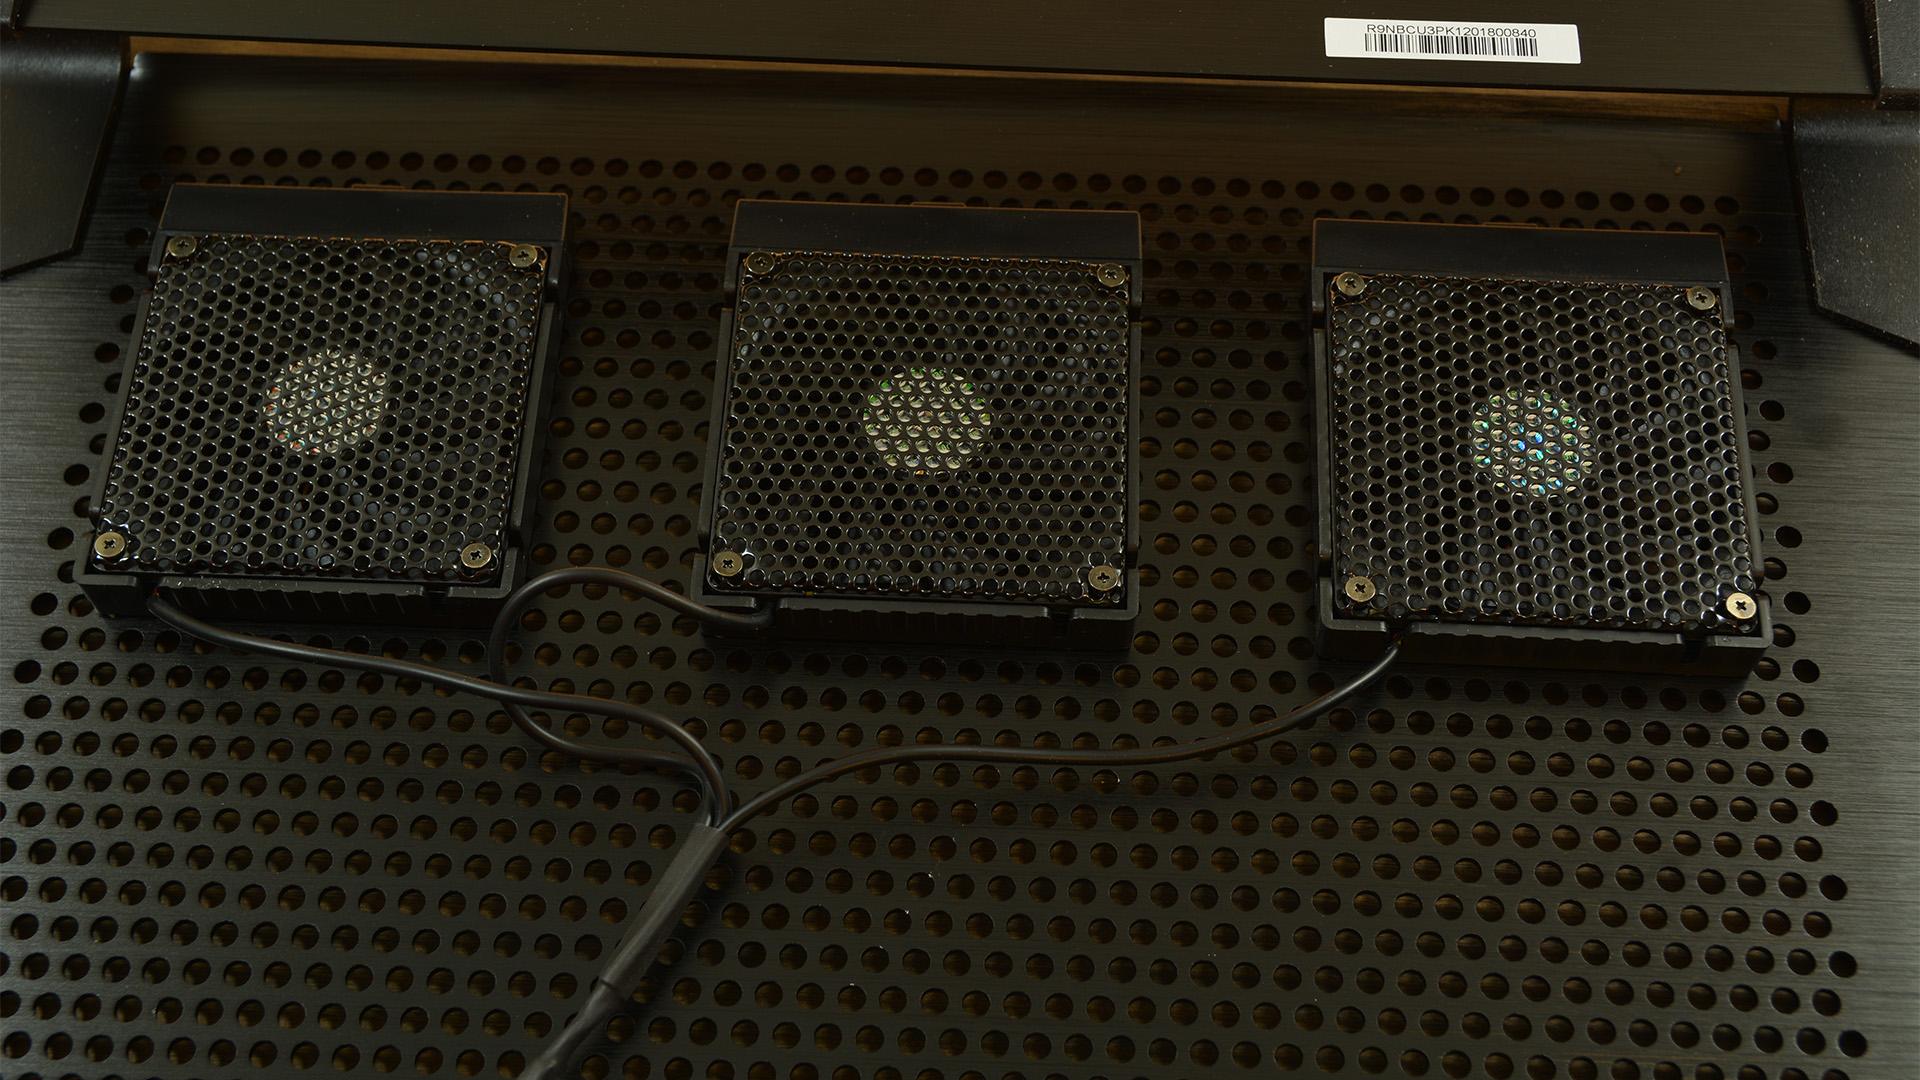 Cooler Master NotePal U3 Plus fans attached